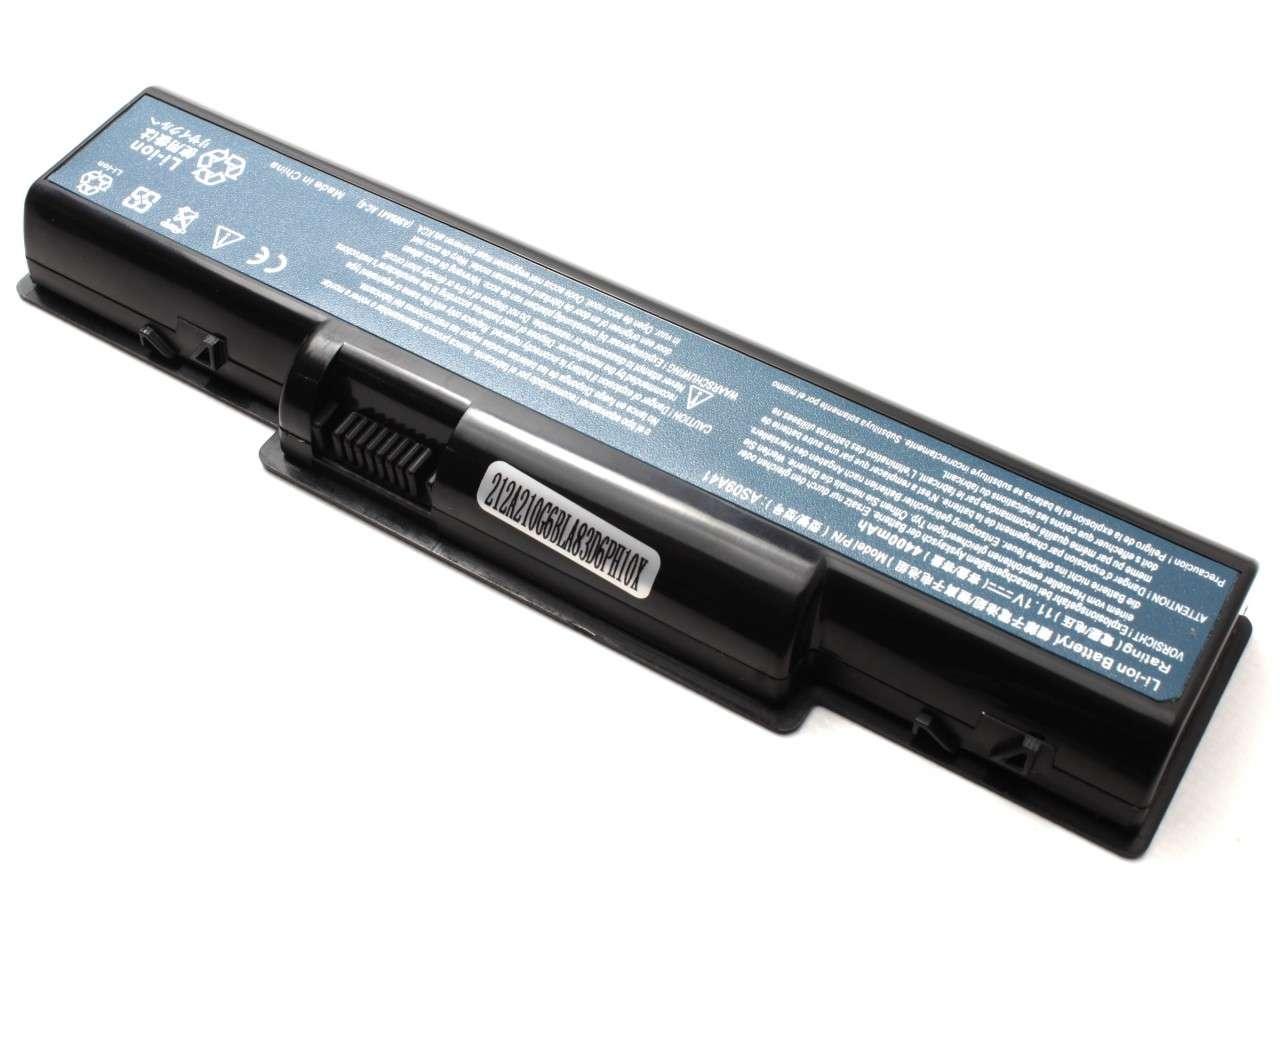 Baterie Acer Aspire 4930 Ver.2 imagine powerlaptop.ro 2021